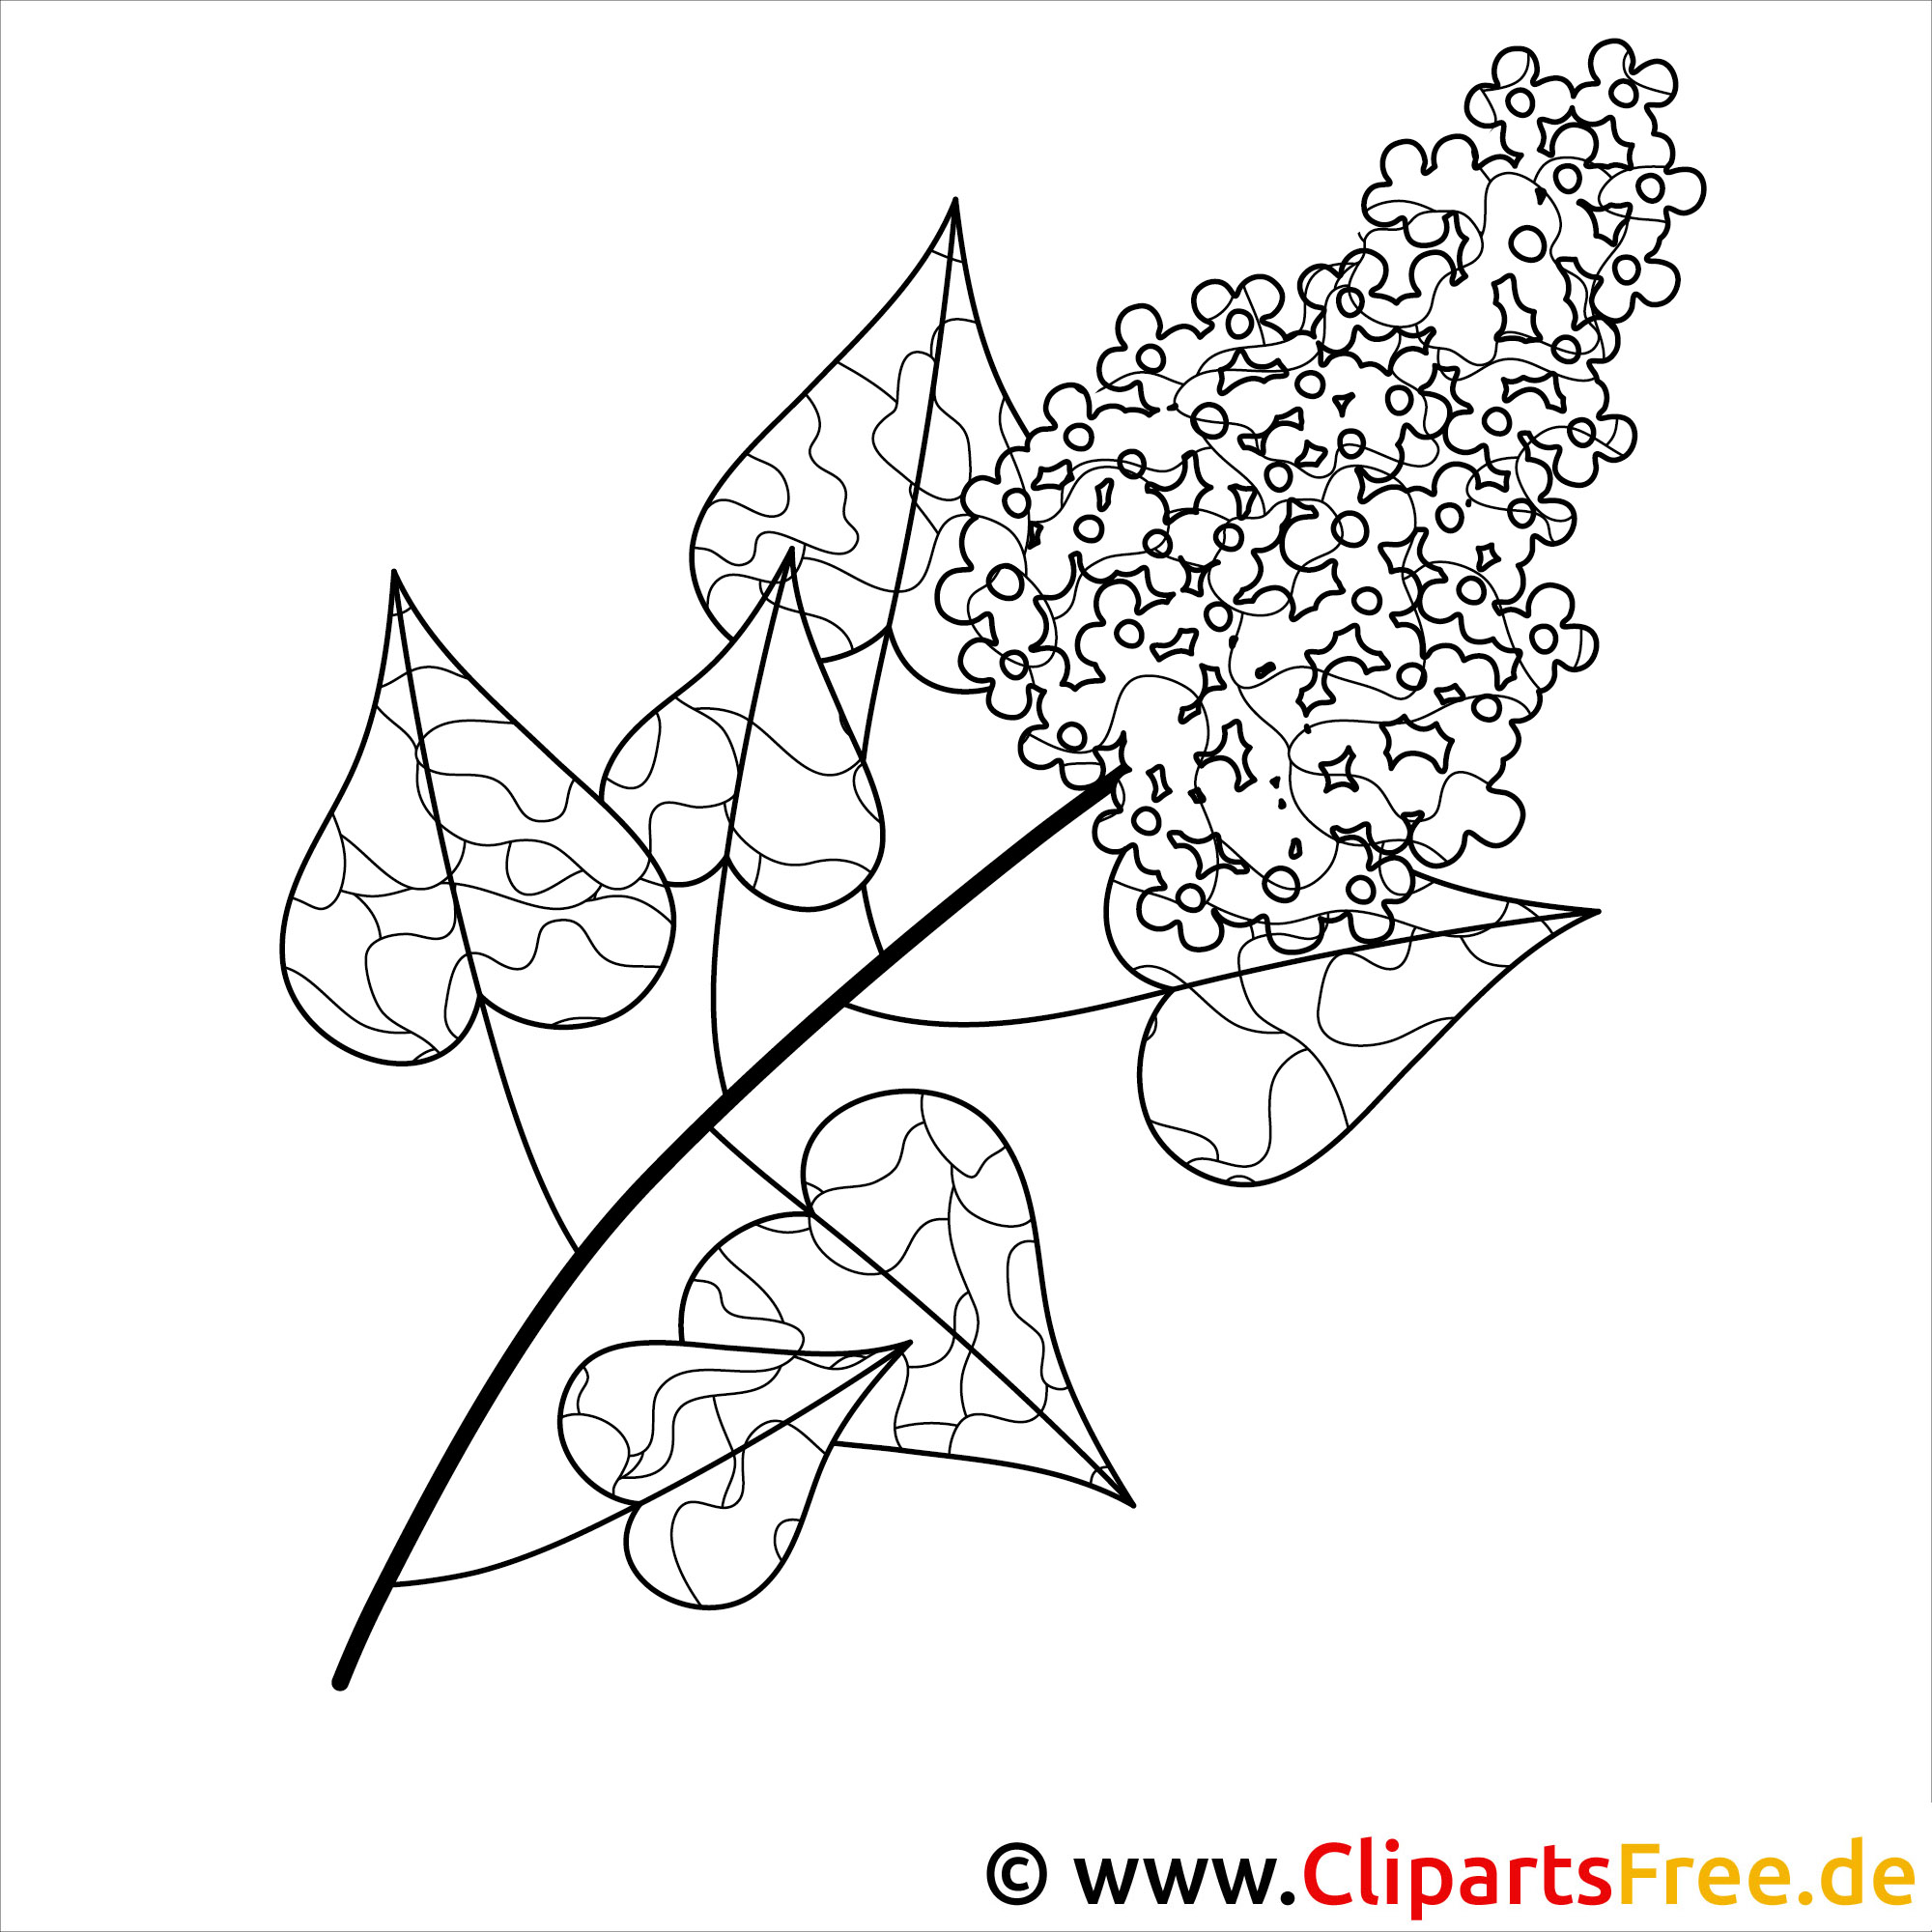 Ausmalbilder Fruehlingsblumen - Flieder